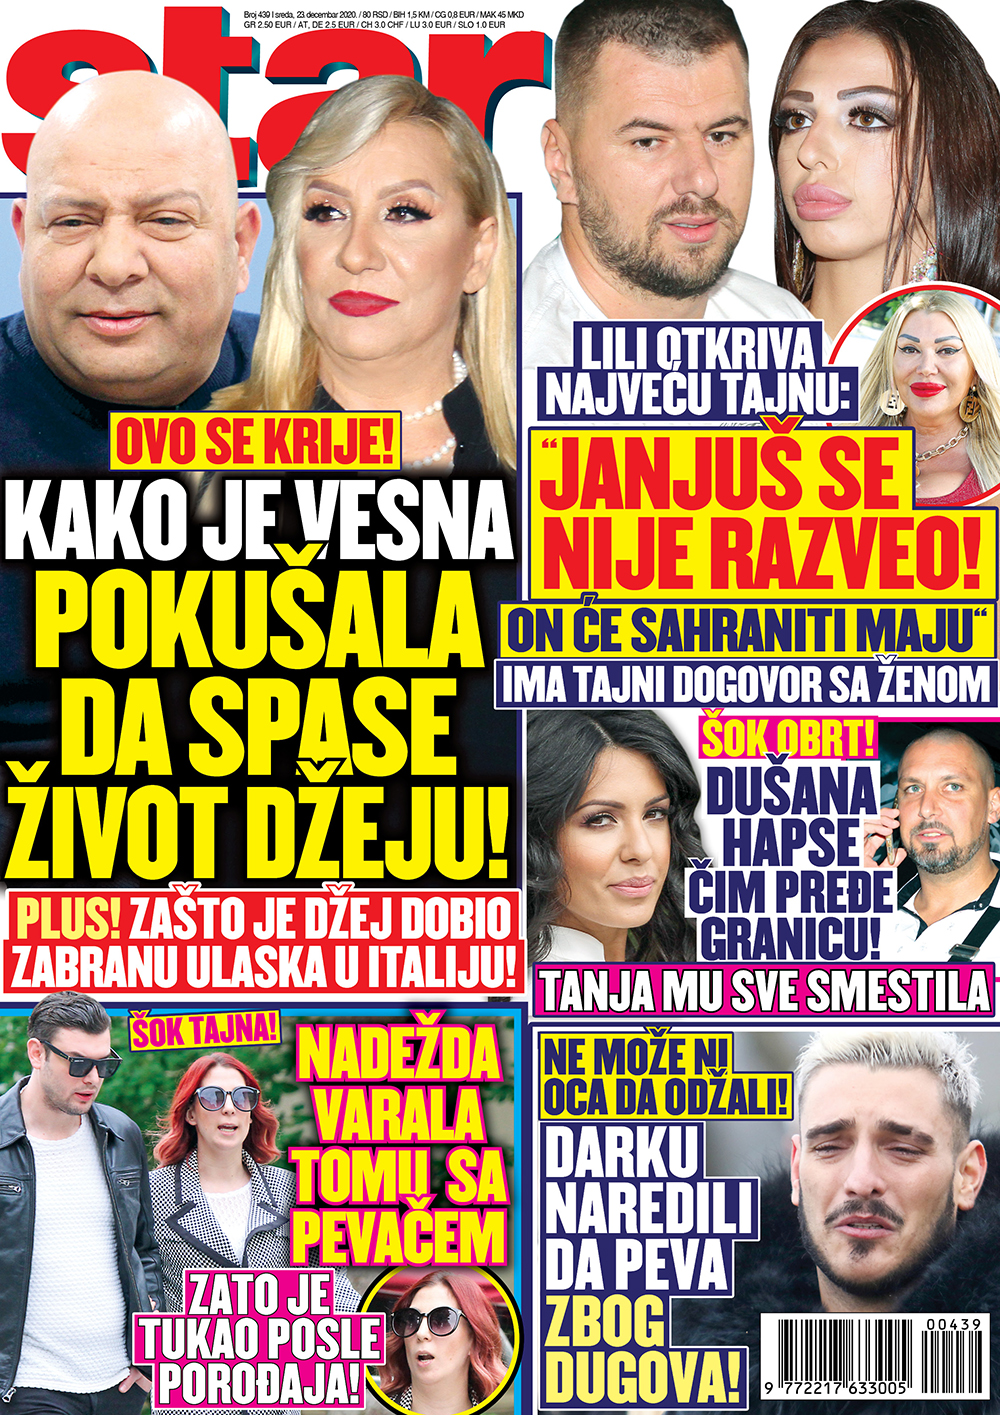 Novi Star